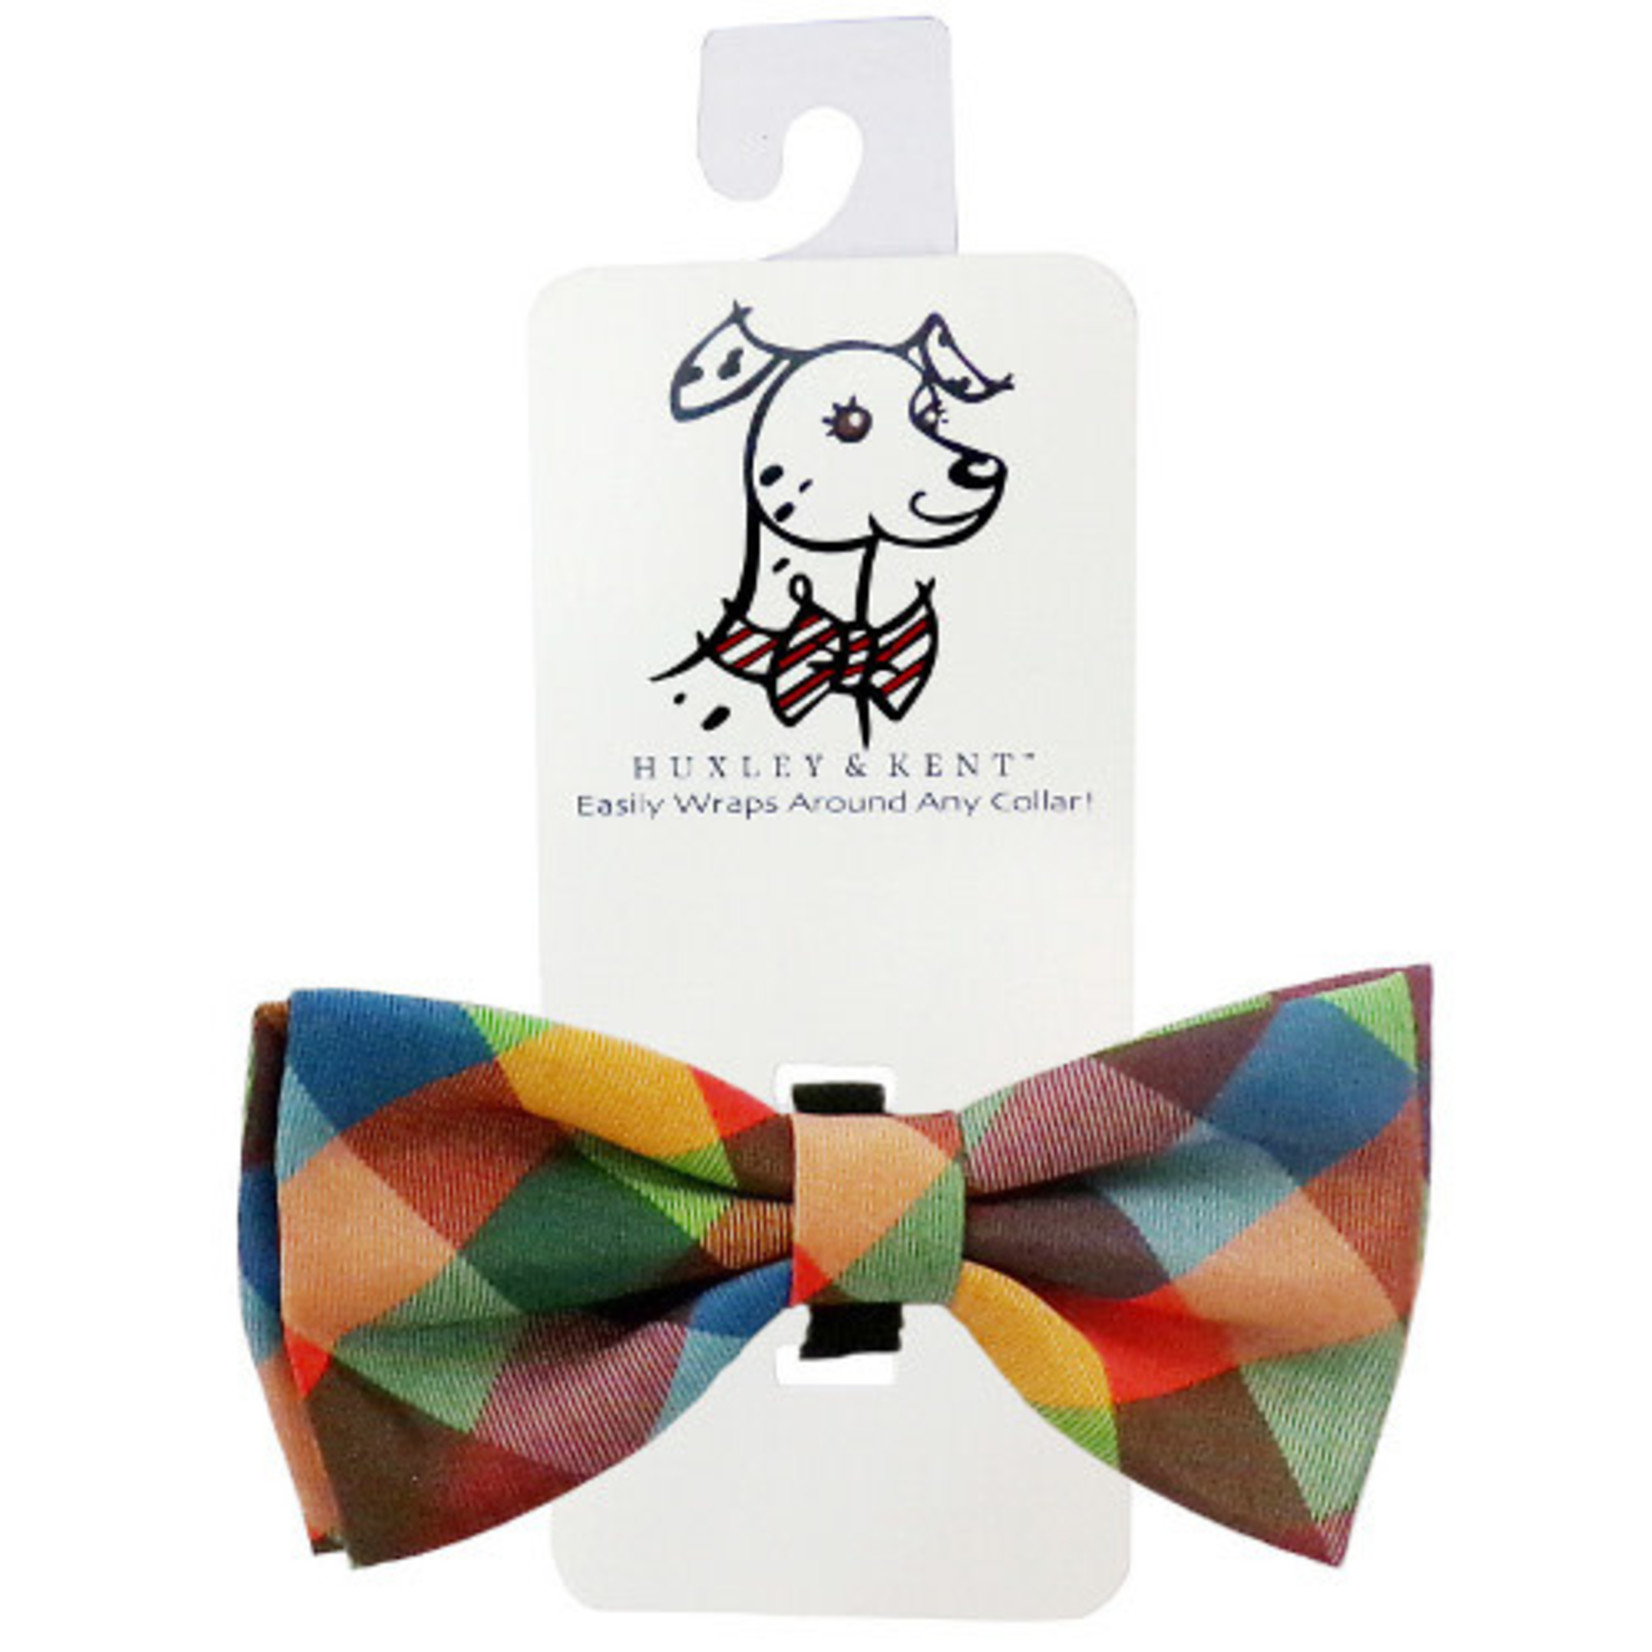 Huxley & Kent Huxley & Kent Fall Check Bow Tie Dog